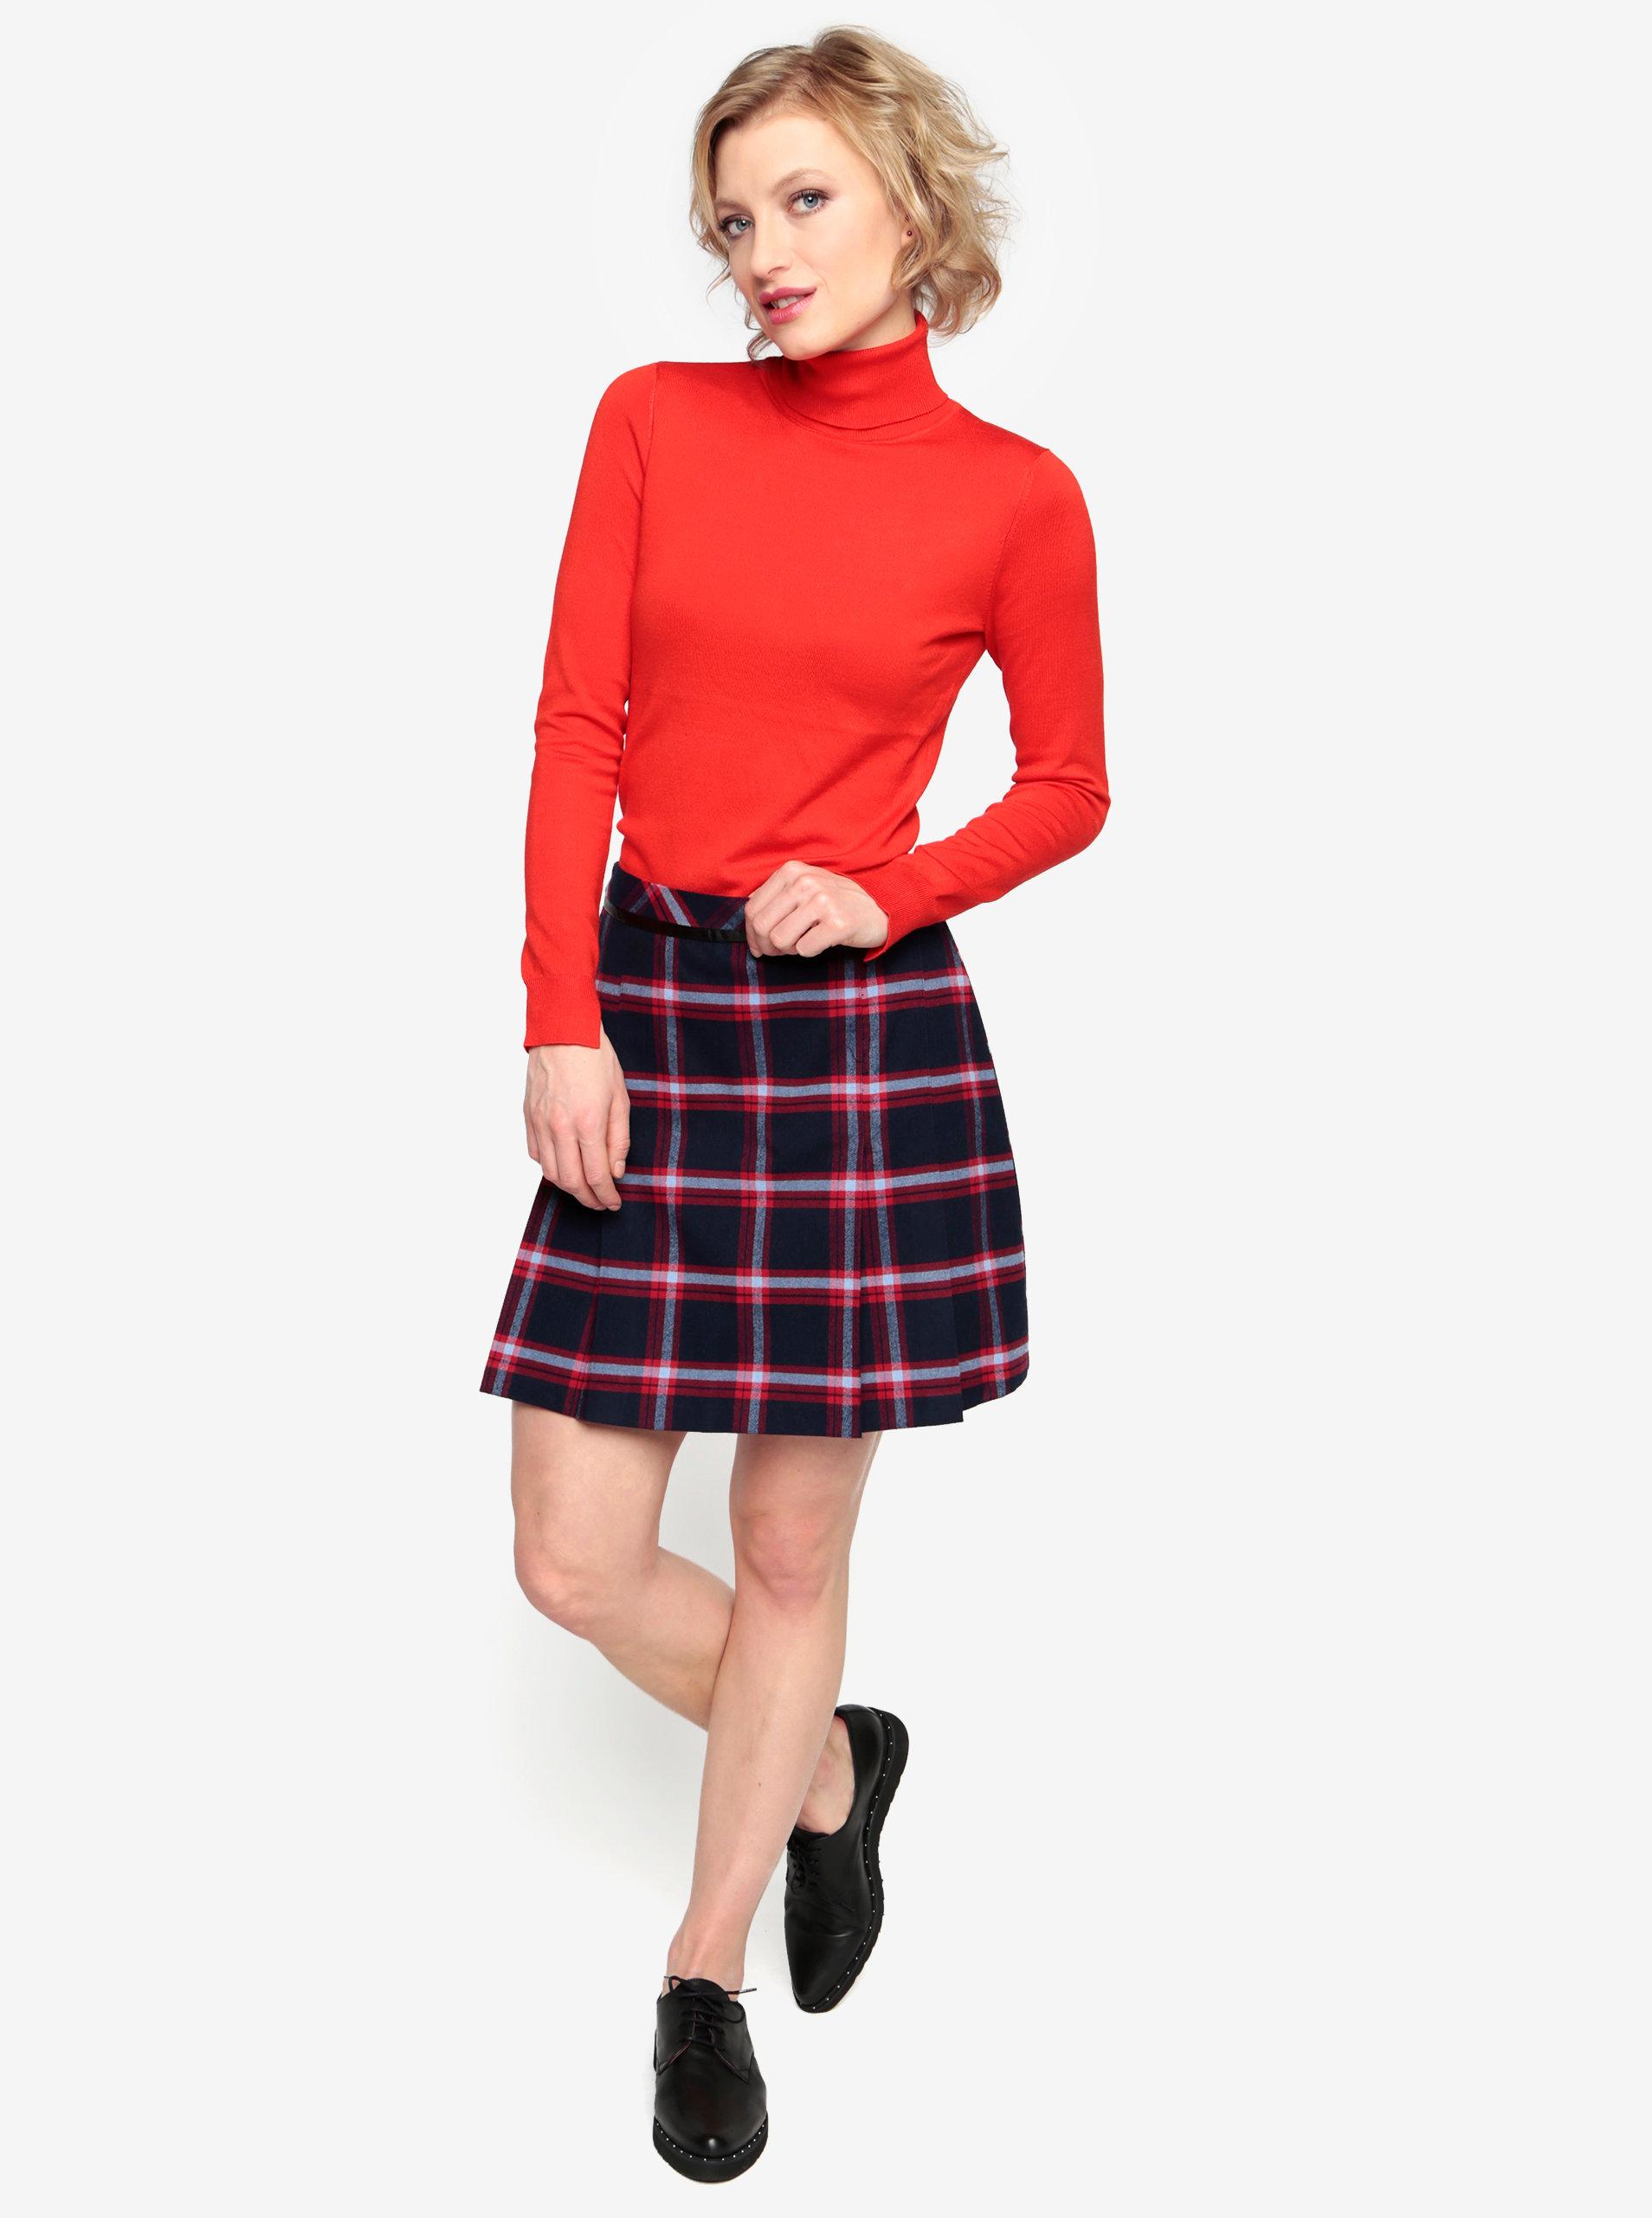 41b6e6749e51 Tmavomodrá károvaná sukňa Oasis Marais ...